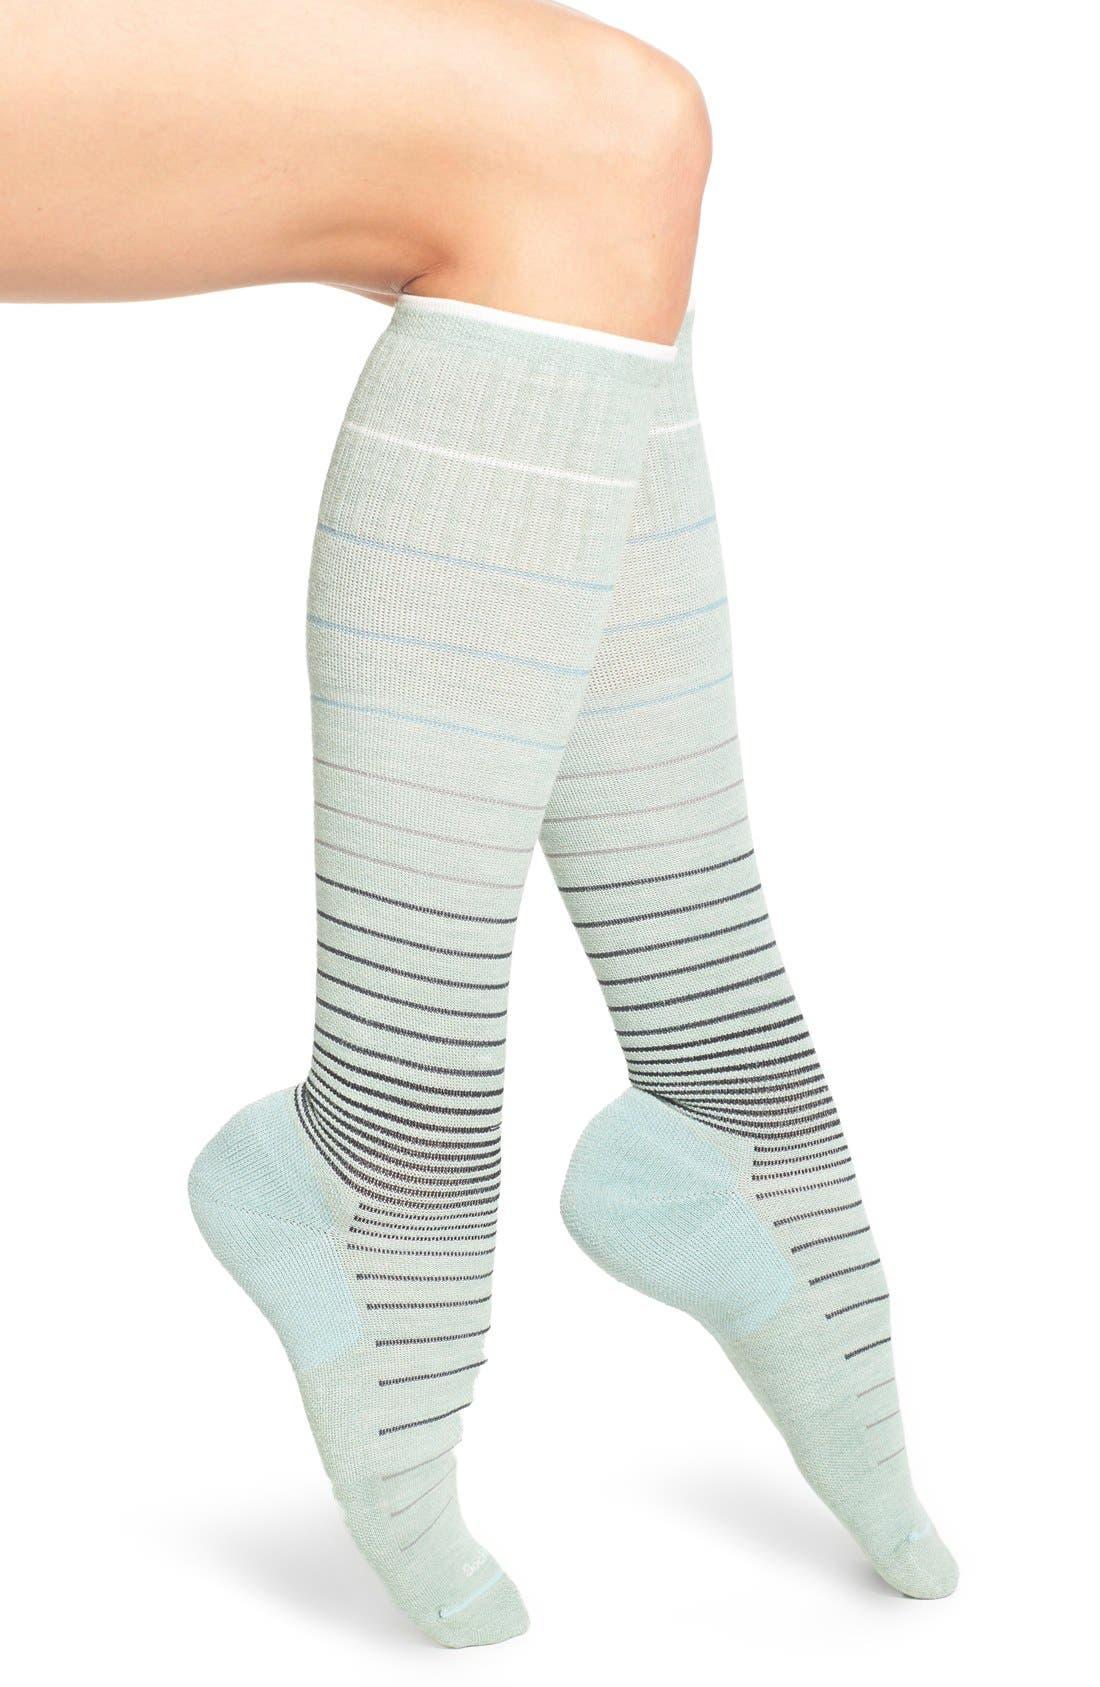 Sockwell Goodhew - Circulator Compression Socks